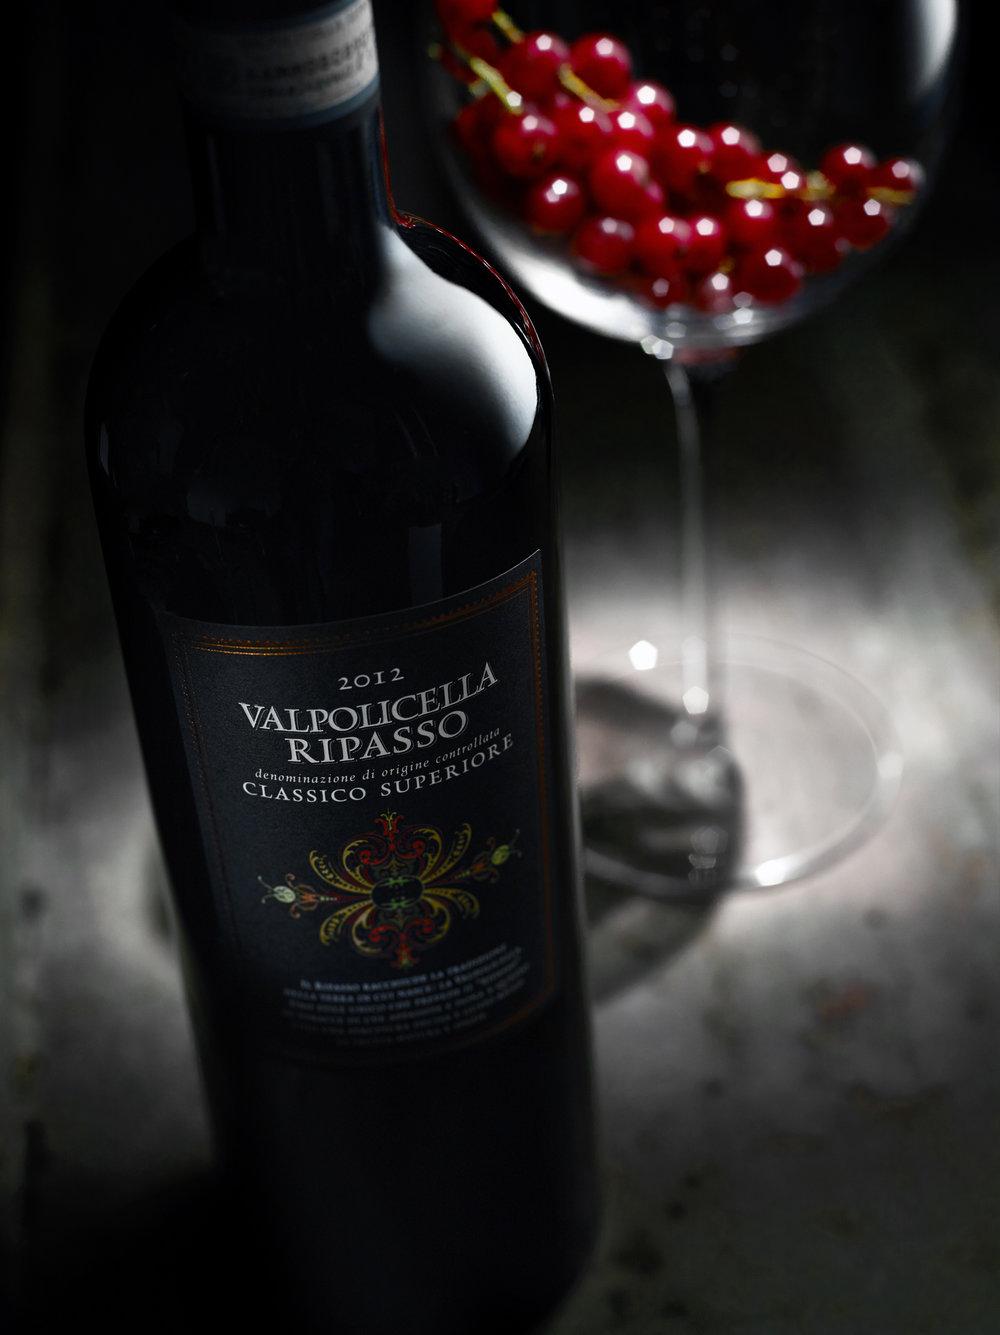 Wino_na_Wielkanoc_14216_S_195673.jpg